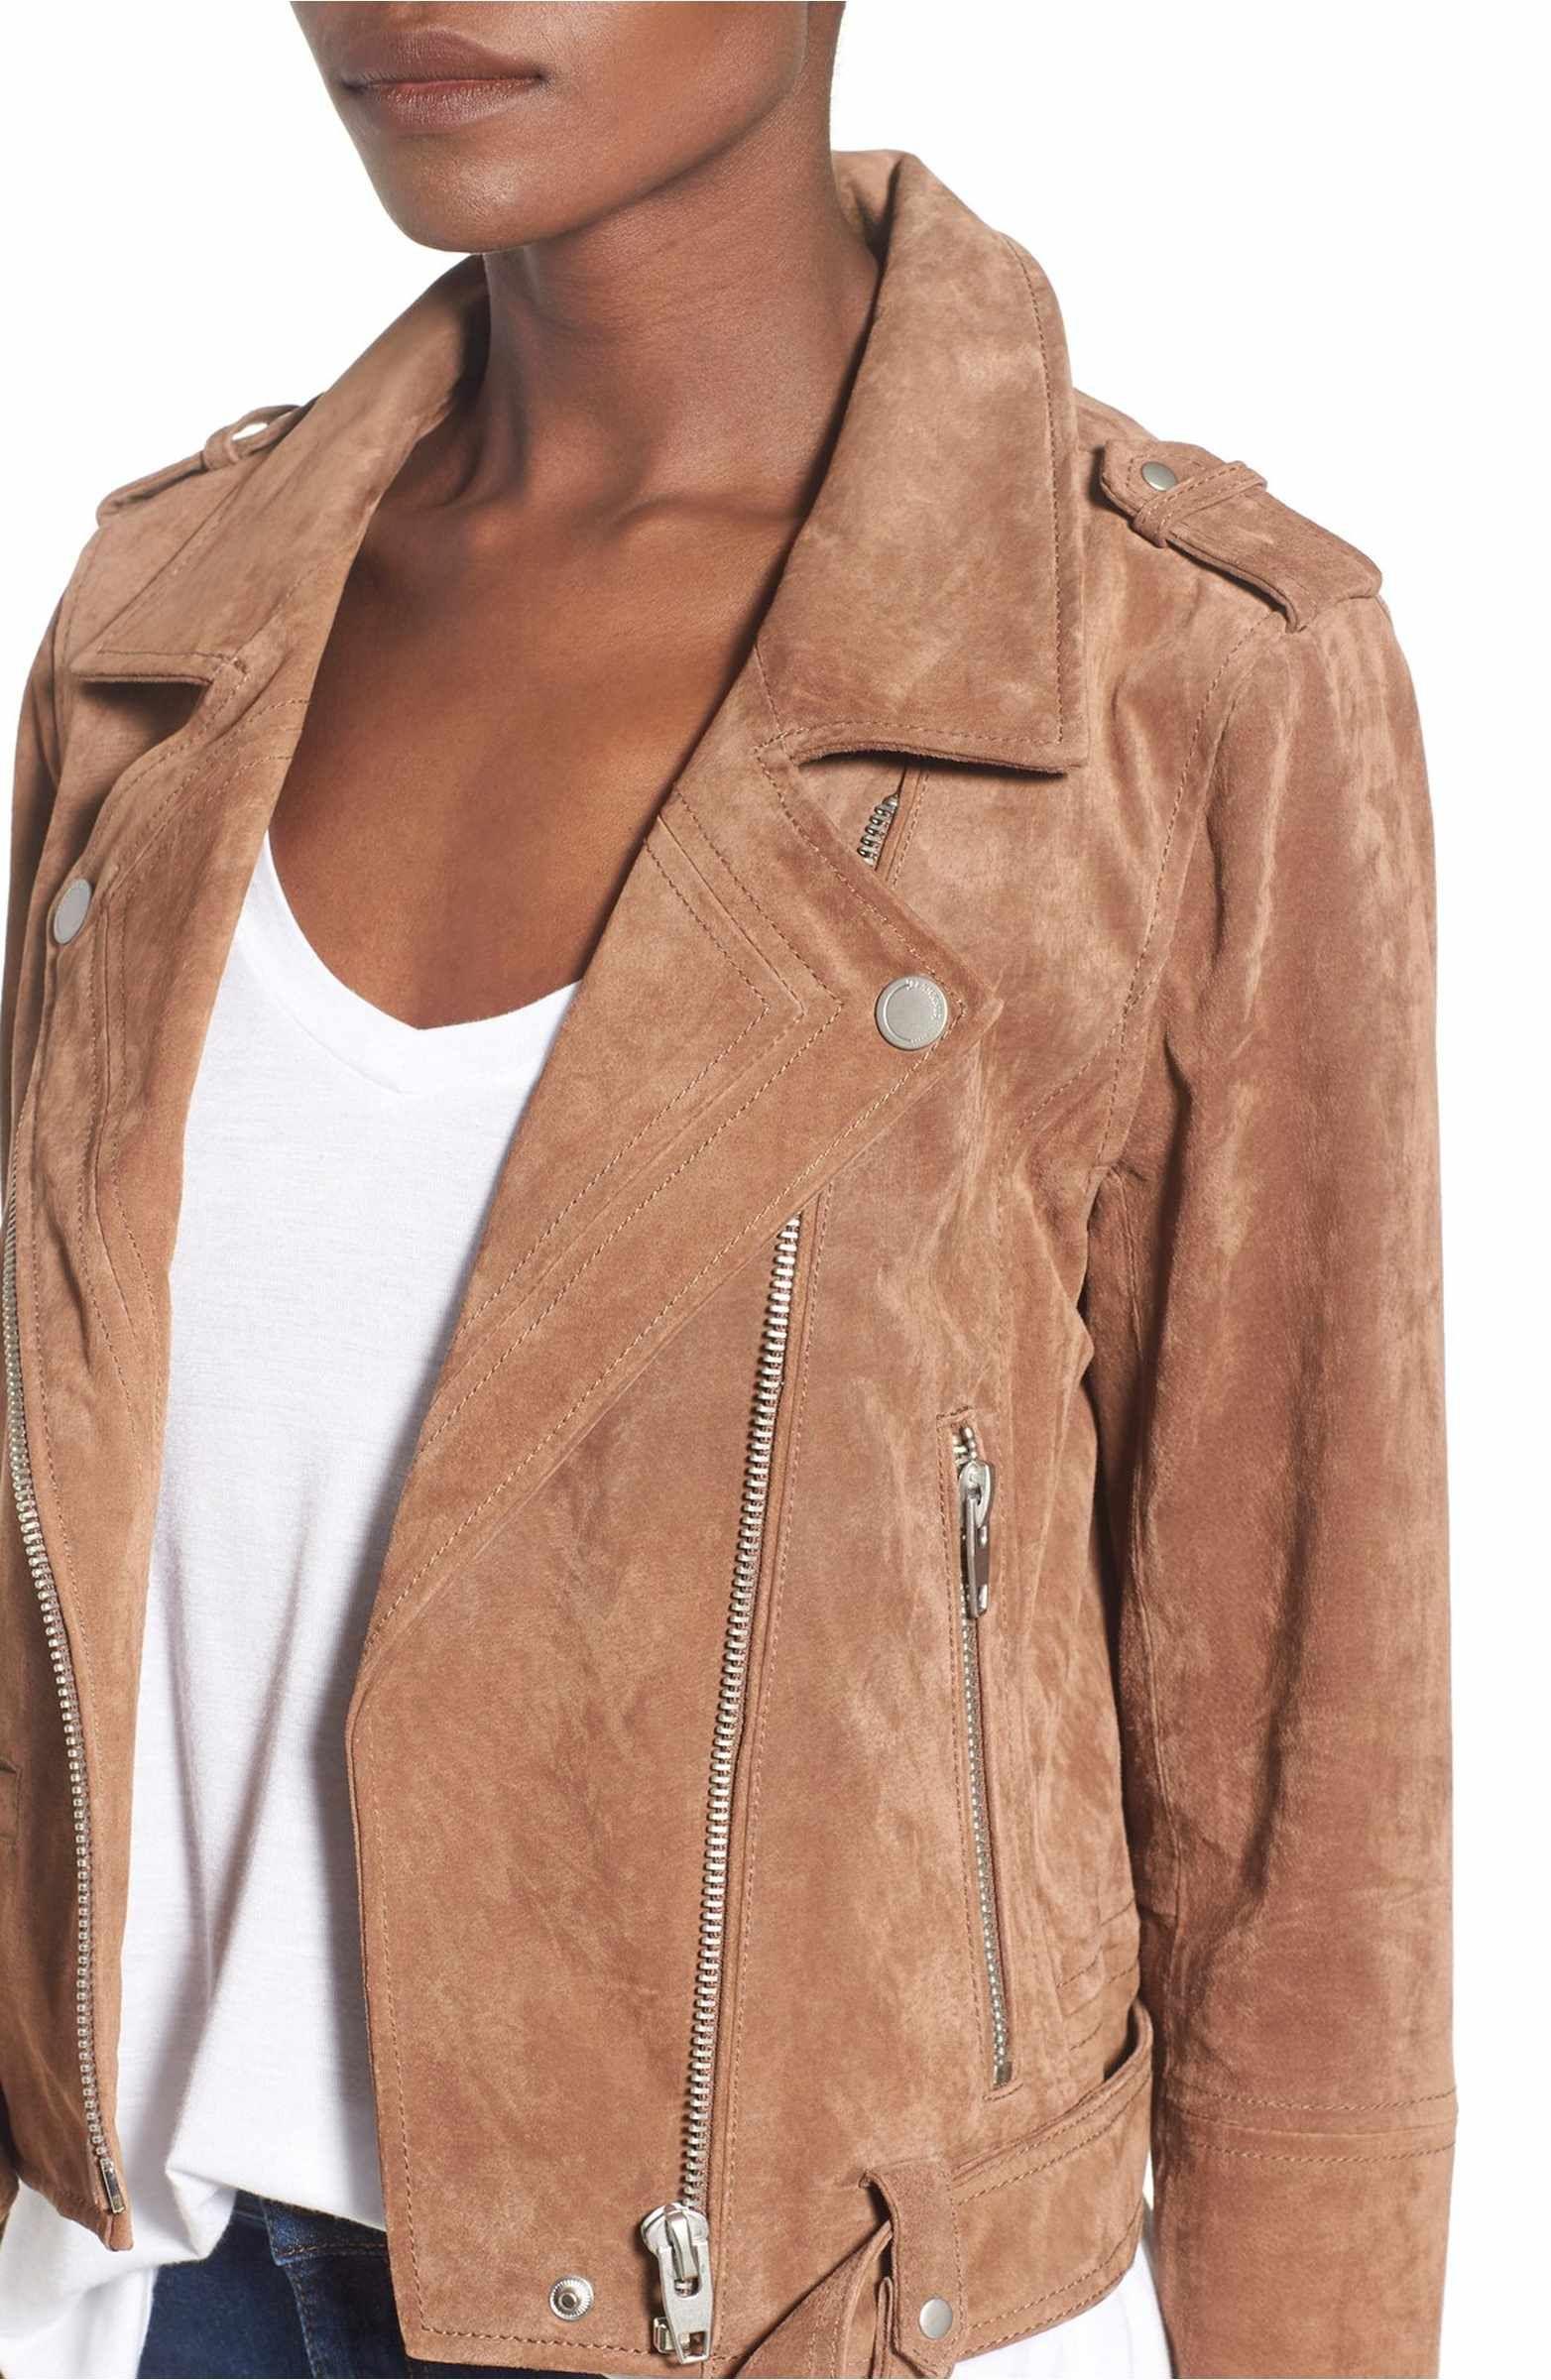 BLANKNYC Morning Suede Moto Jacket Suede moto jacket